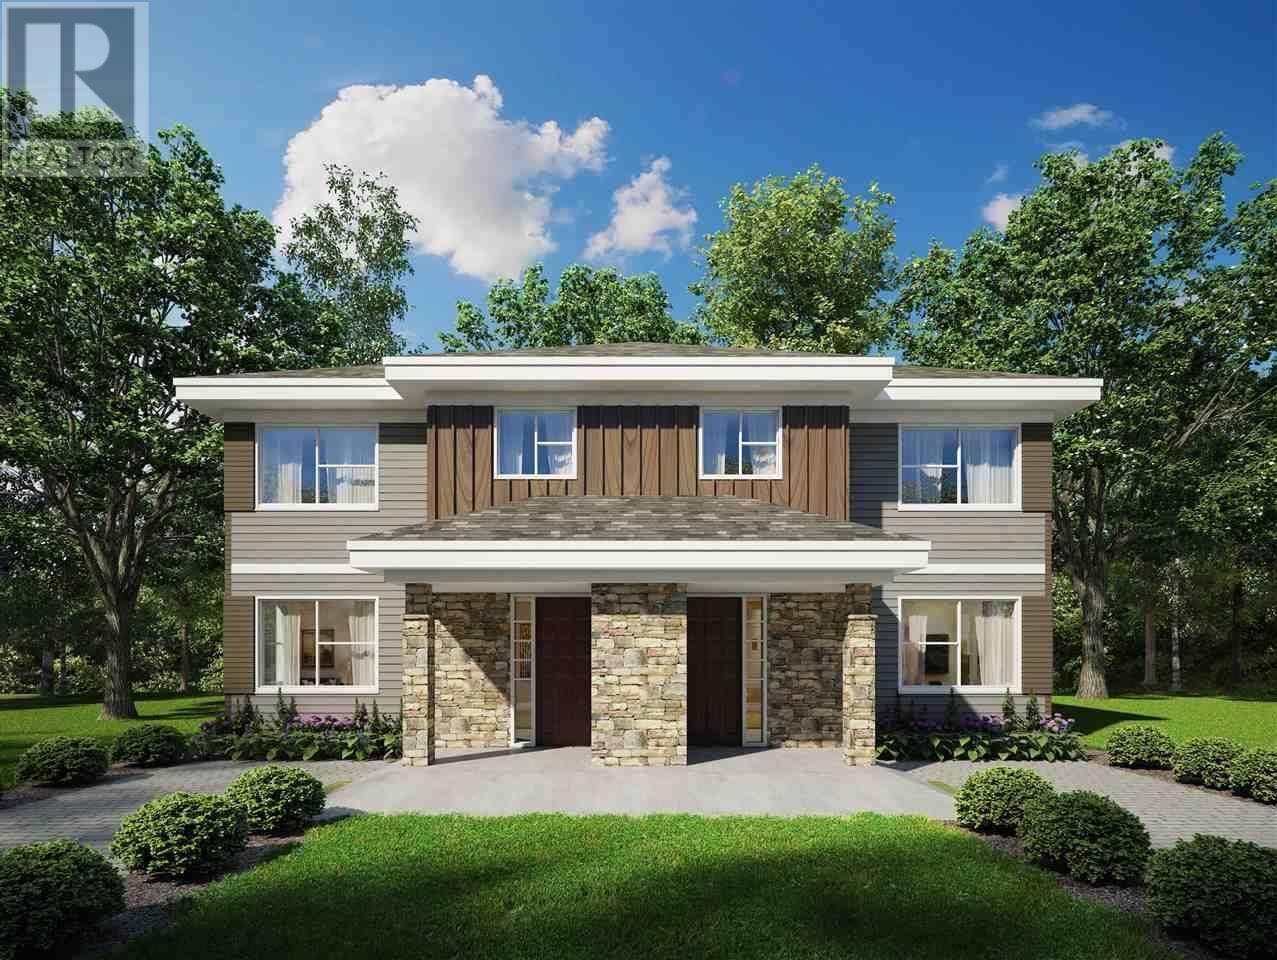 House for sale at 770 Herring Cove Rd Unit A Herring Cove Nova Scotia - MLS: 201919227